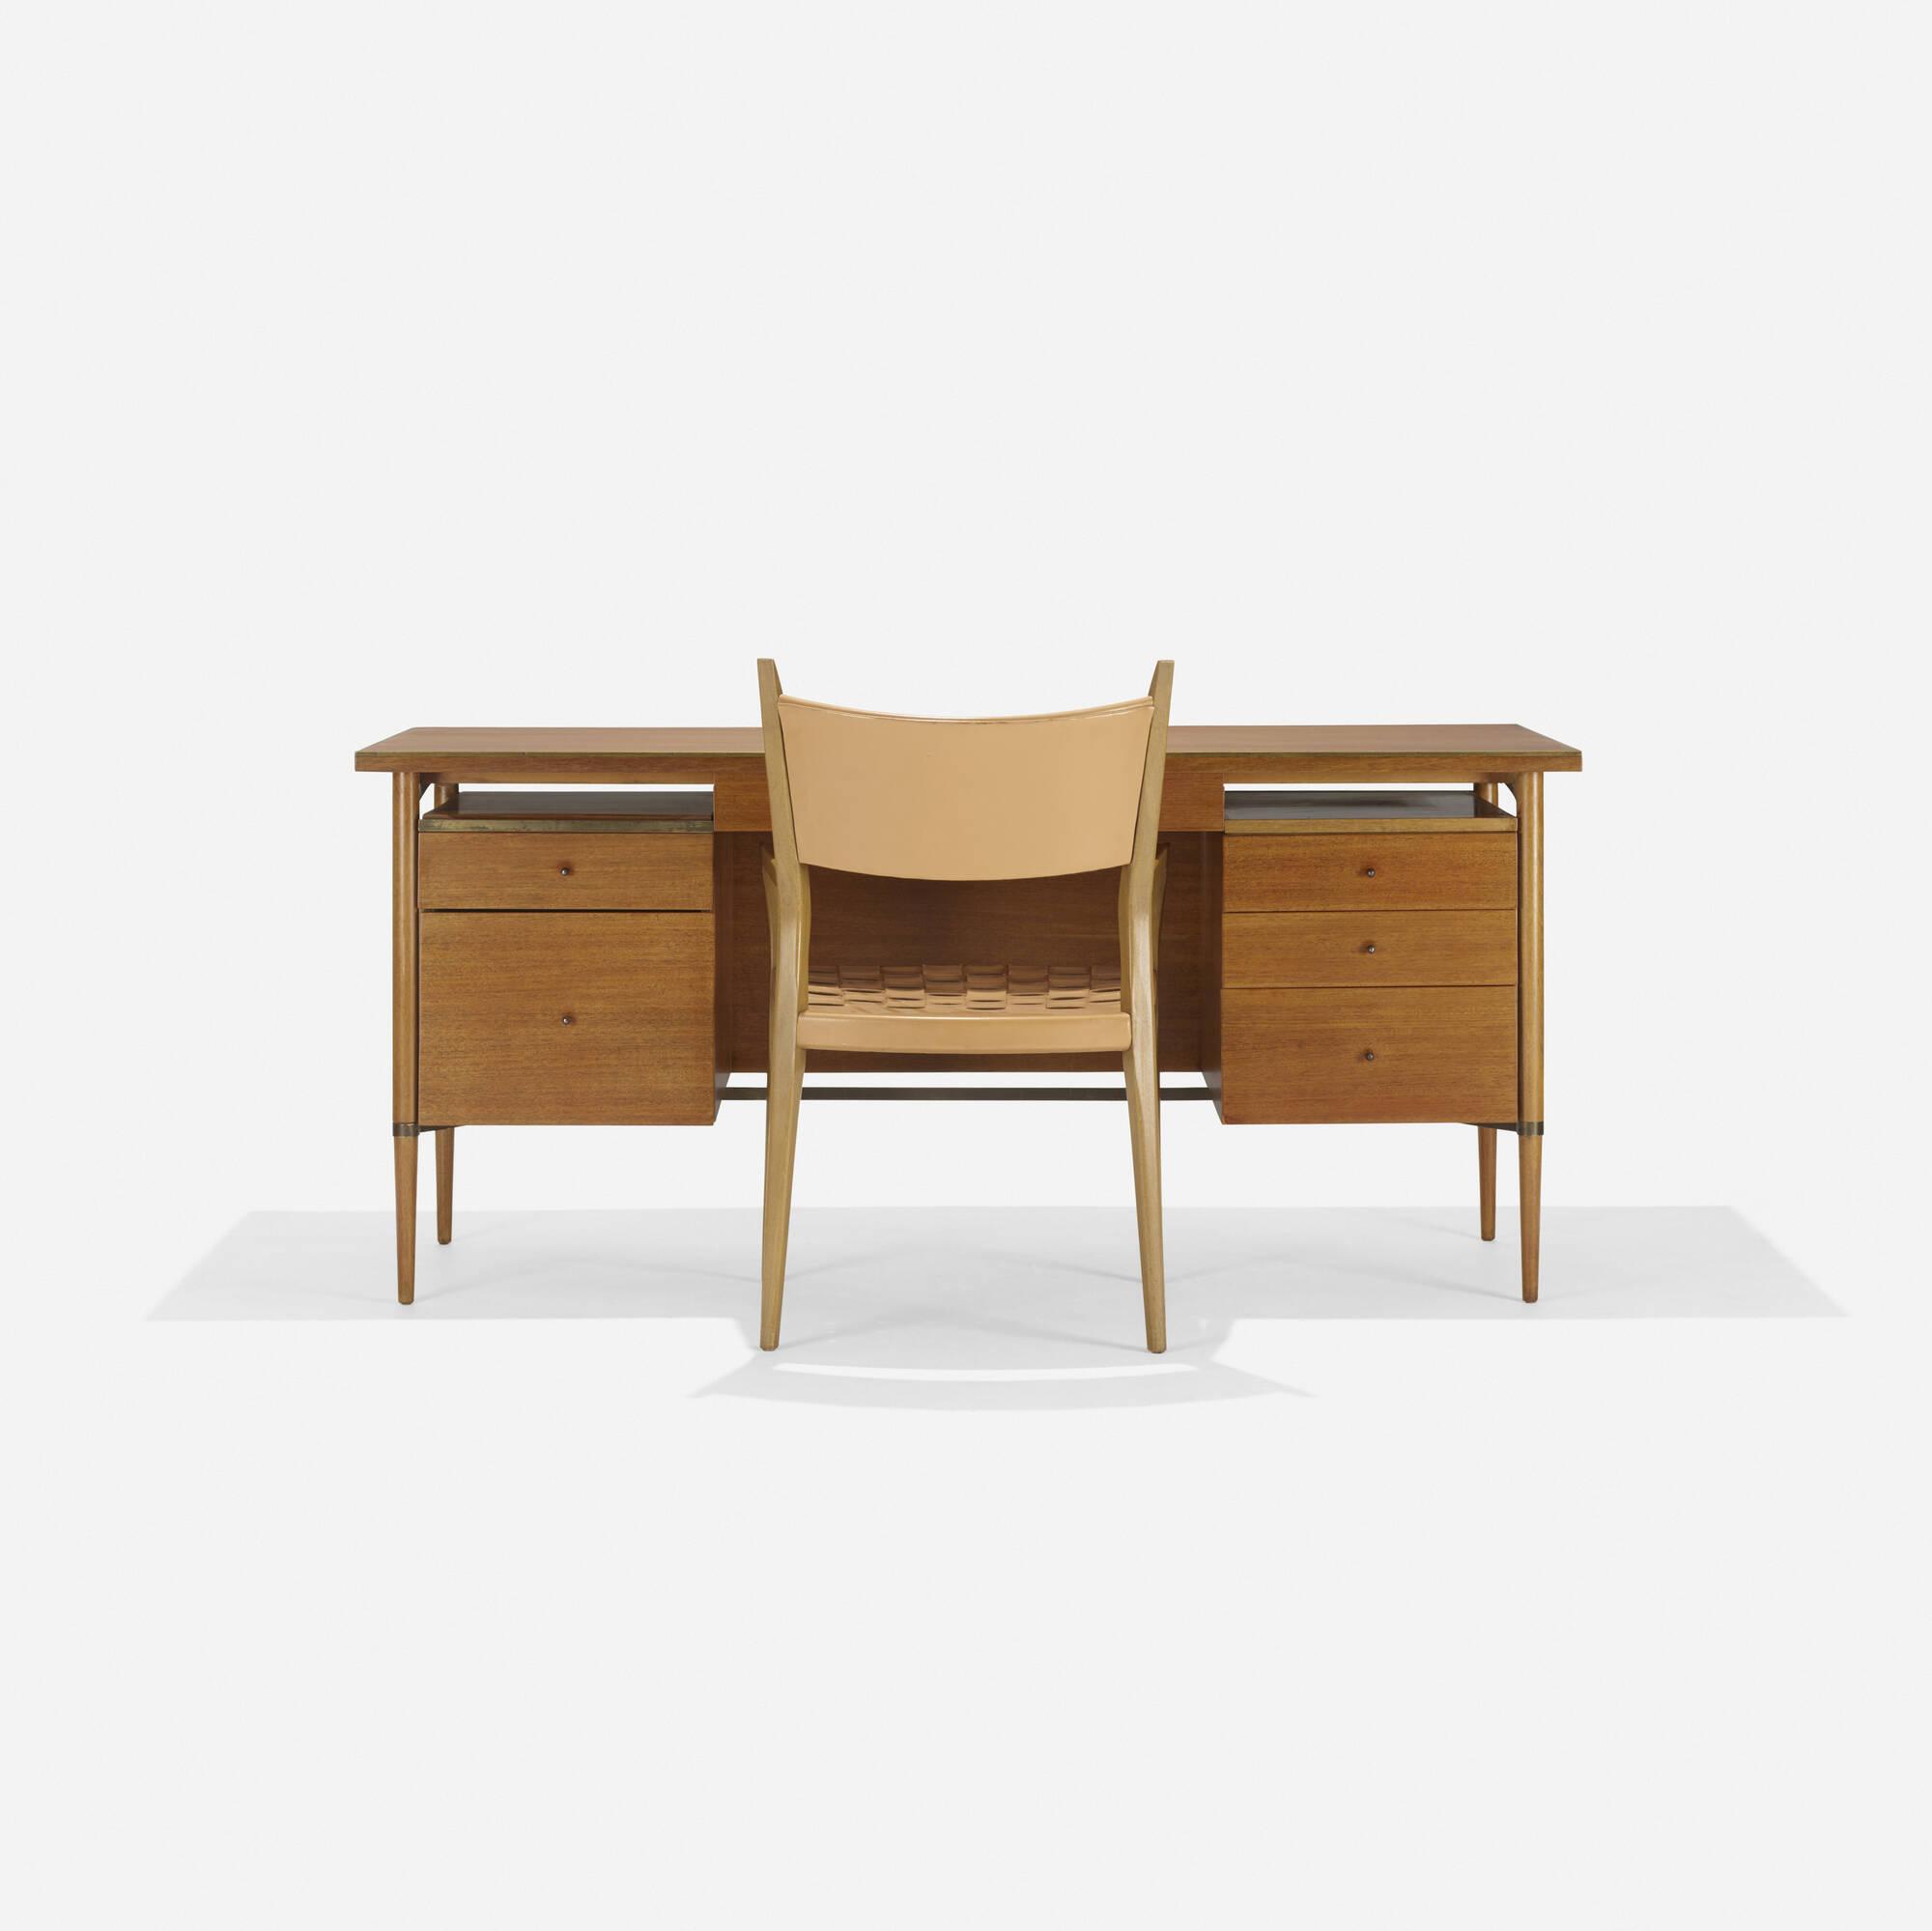 ... 264: Paul McCobb / Connoisseur Collection Desk, Model 7021 And Armchair,  Model 9102